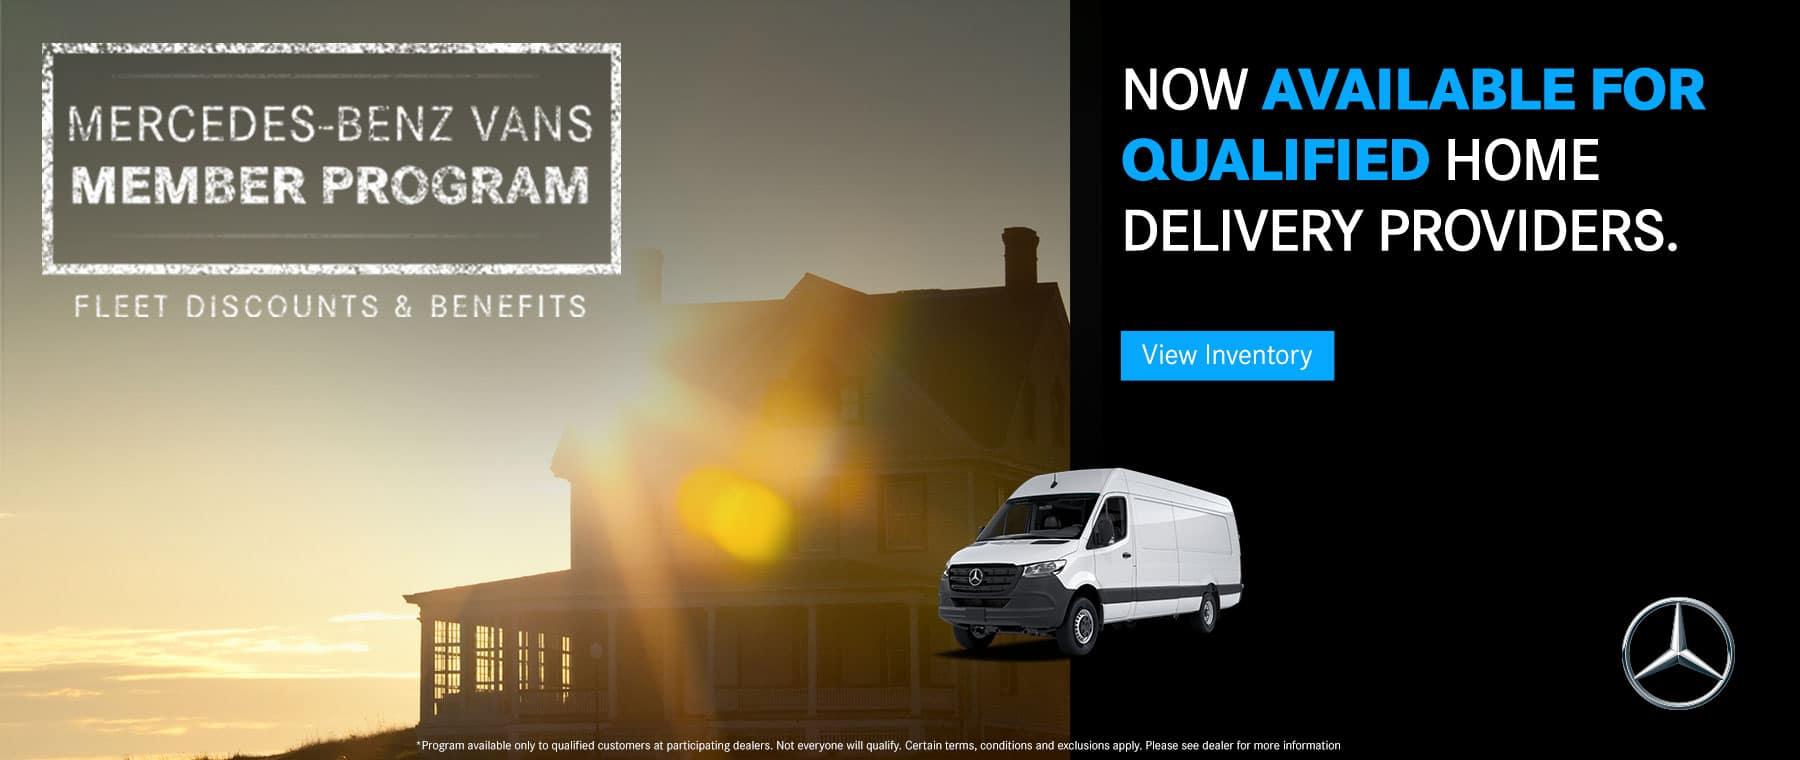 Vans Home Delivery